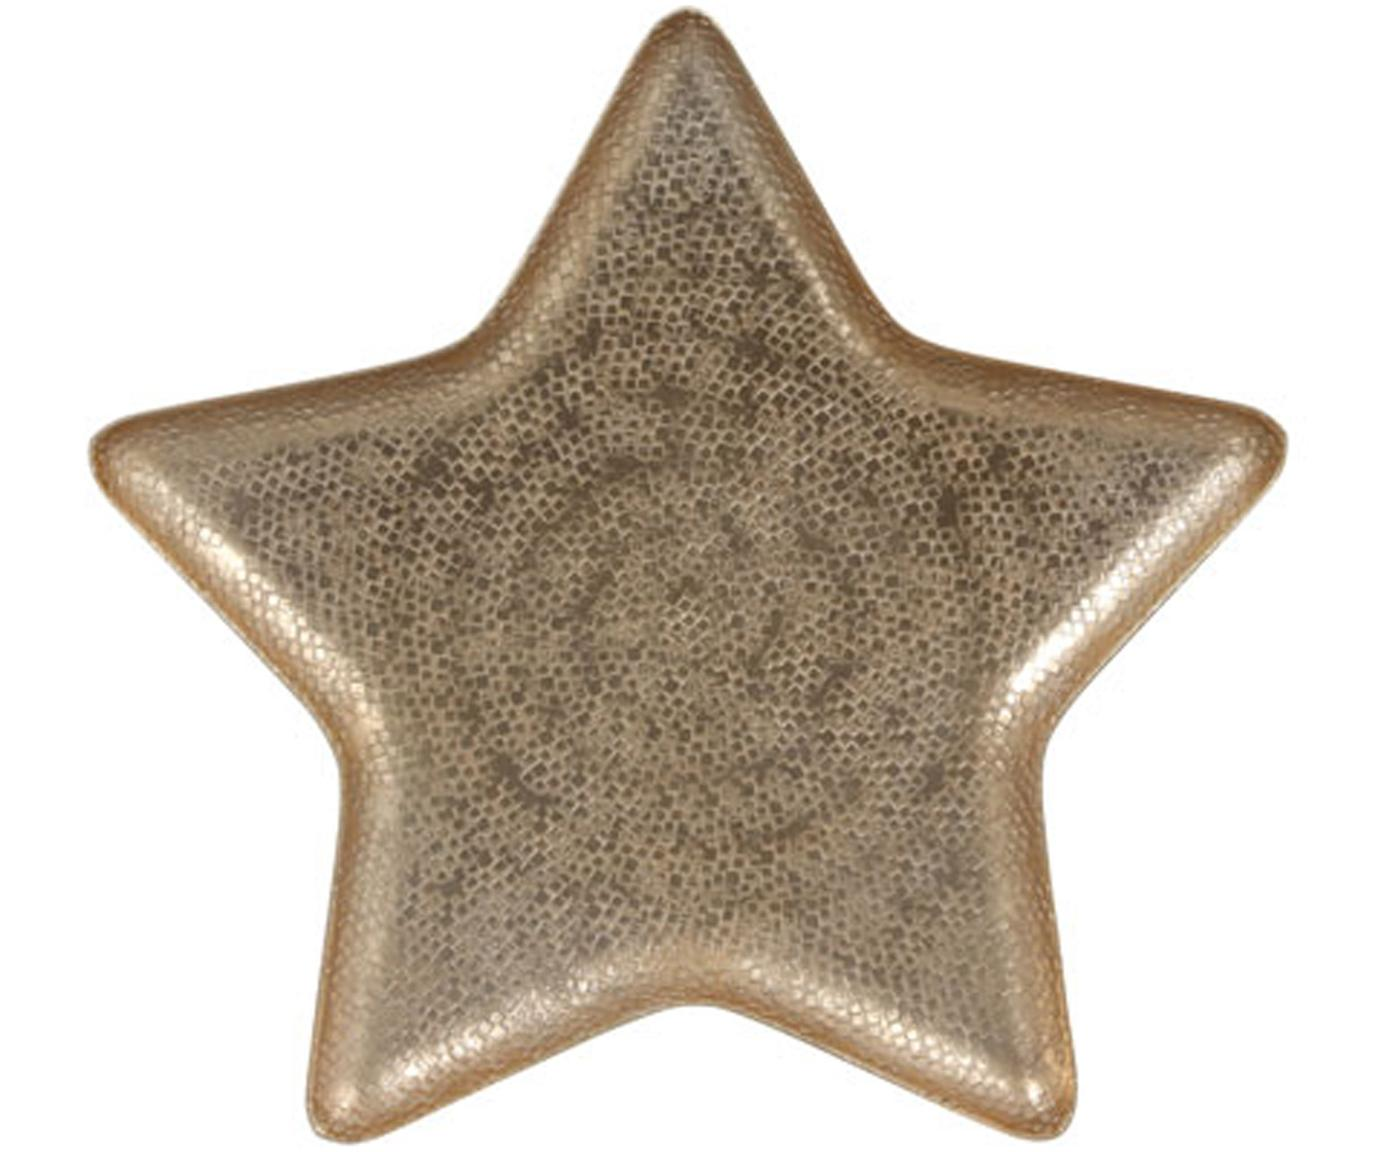 Decoratieve schaal Star, Gecoat aluminium, Mat messingkleurig, 25 x 2 cm